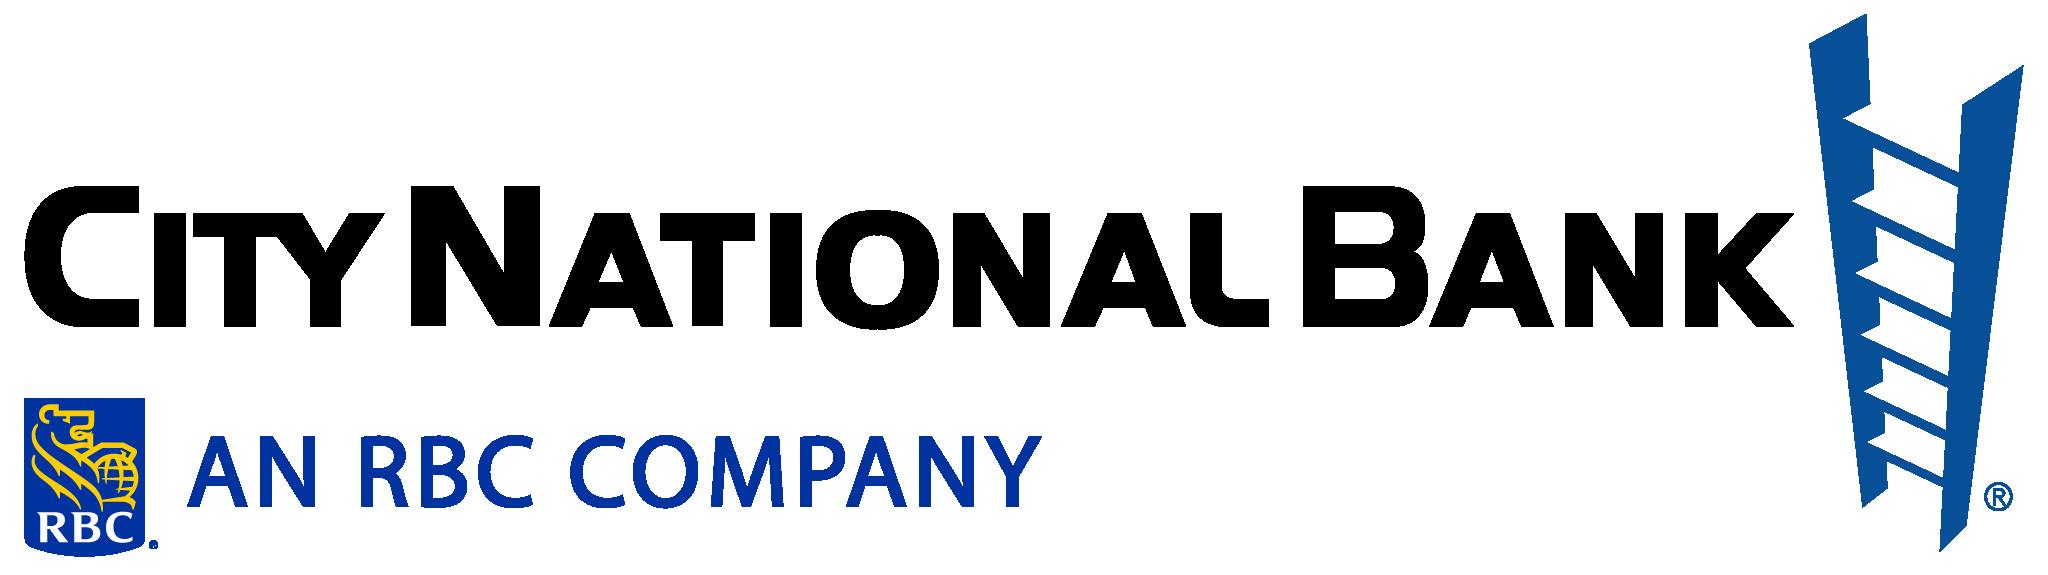 CNB-RBC-Logo-01